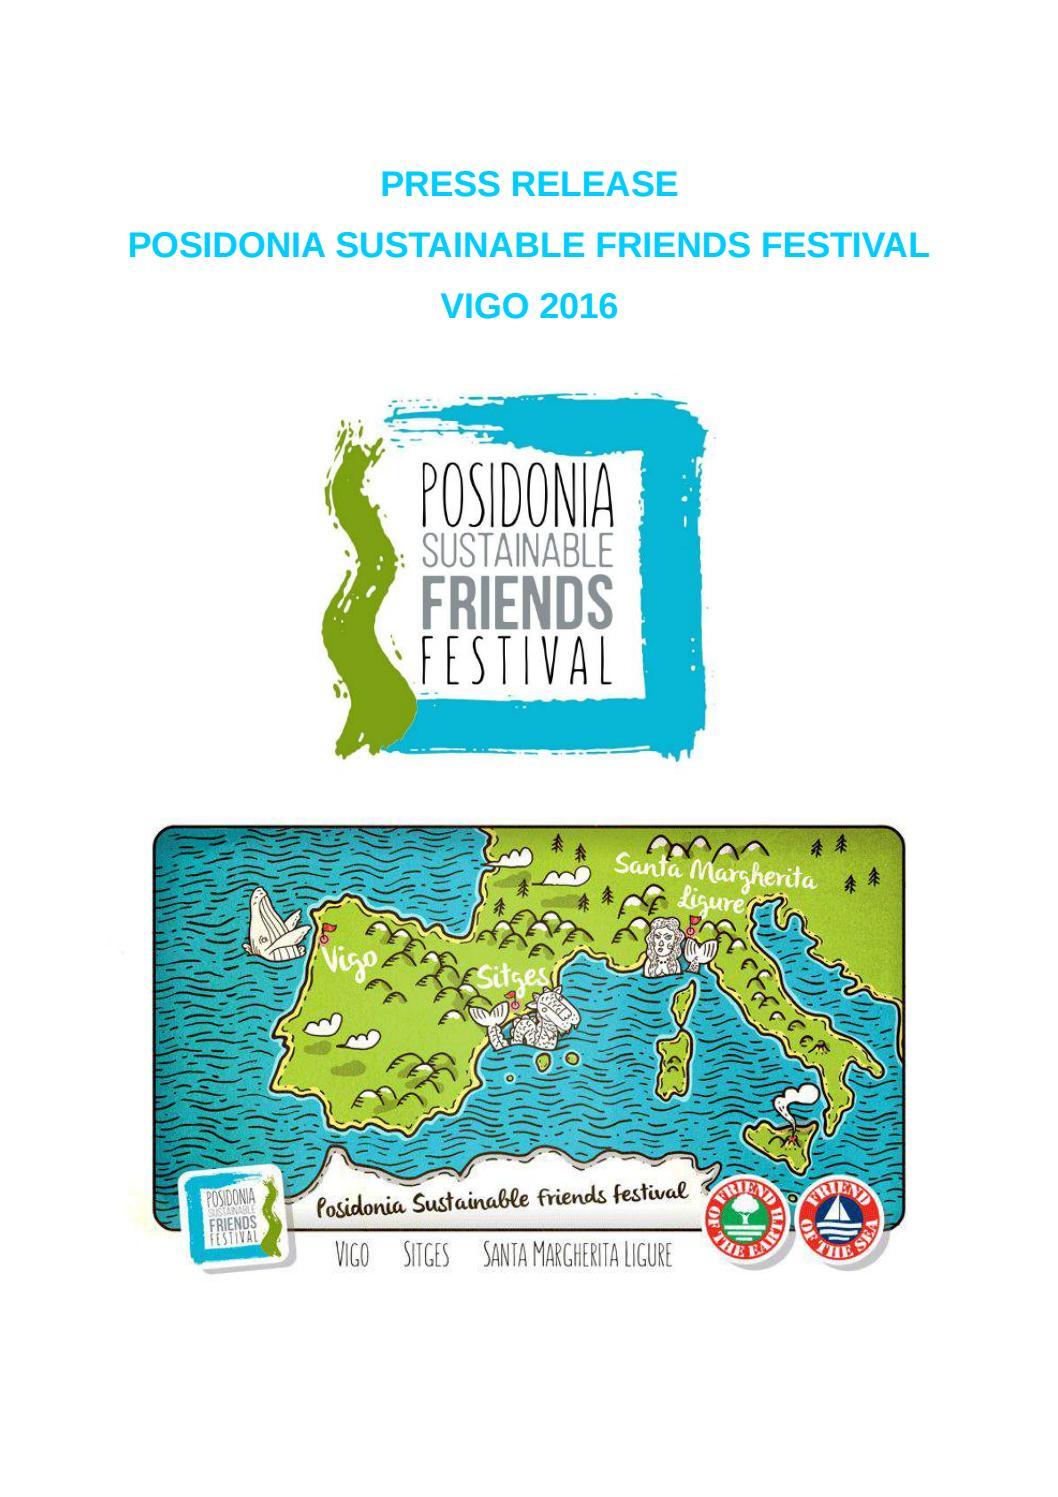 Press Release Posidonia SF Festival VIGO 2016 by Posidonia Green ...